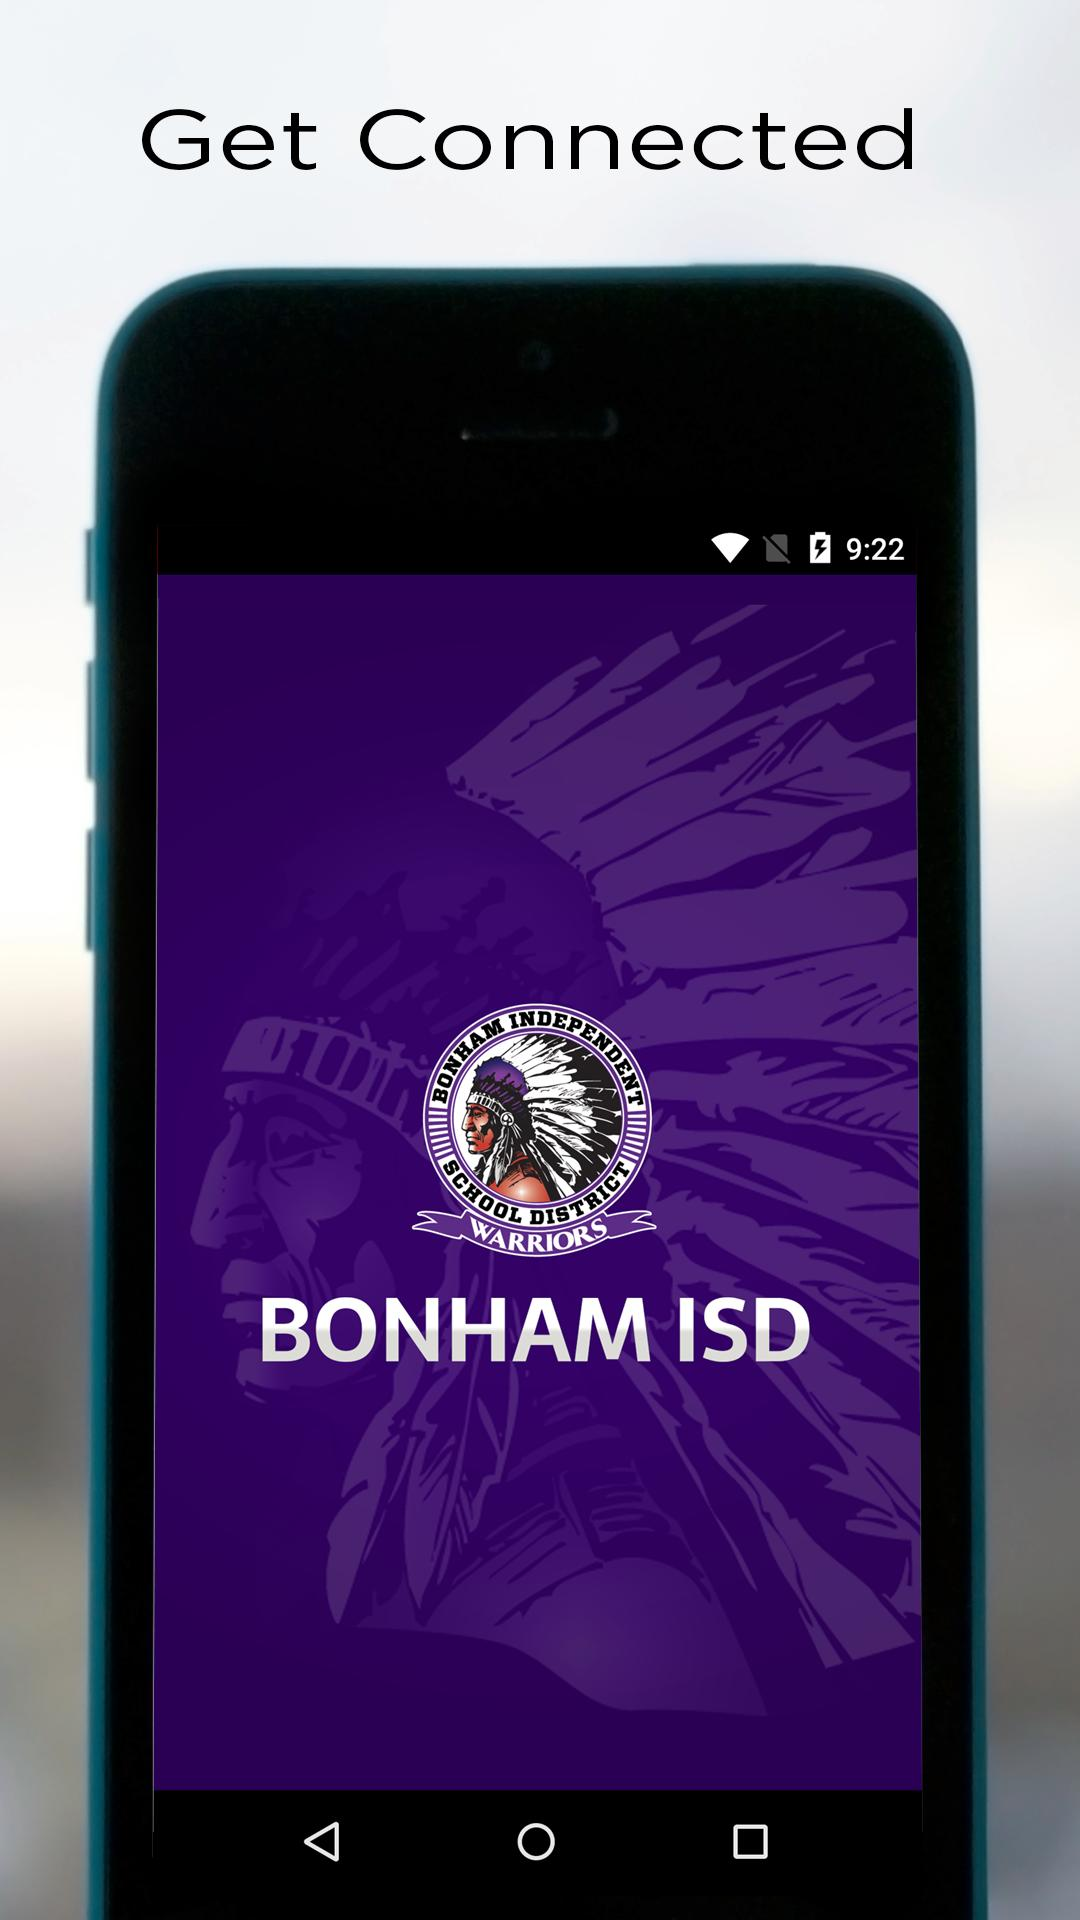 Bonham ISD 1 تصوير الشاشة